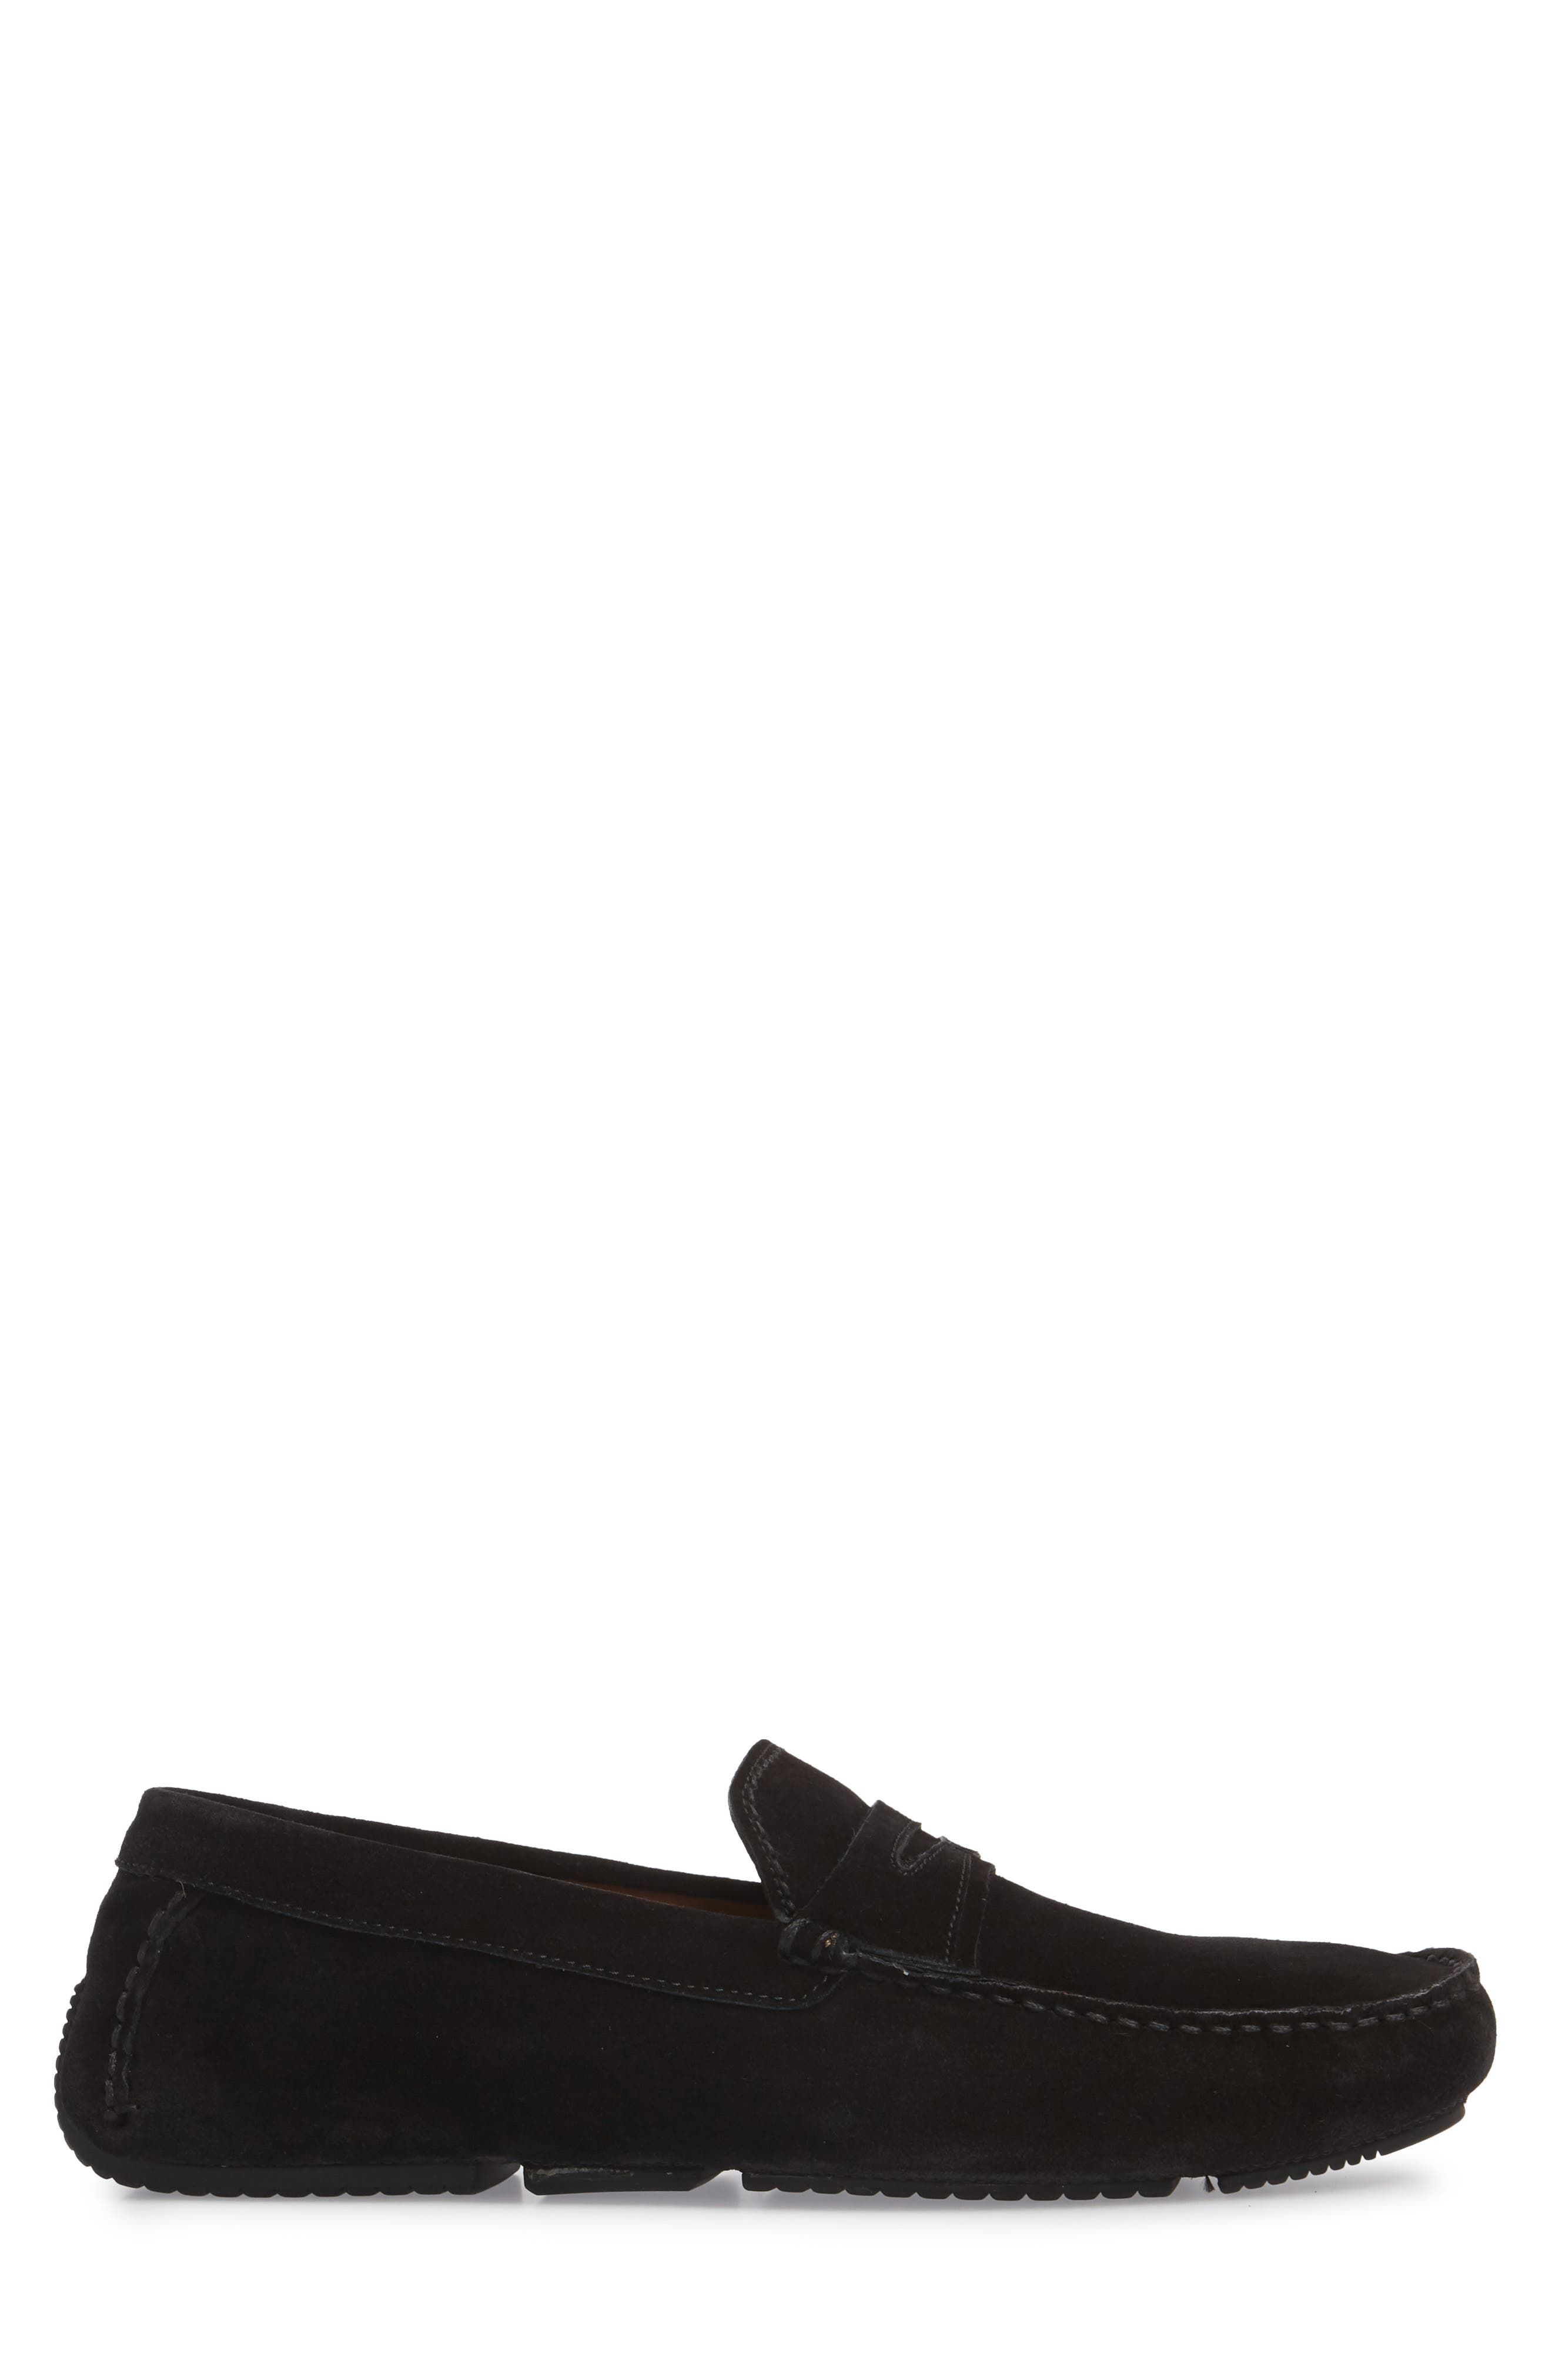 Brandon Weatherproof Driving Loafer,                             Alternate thumbnail 3, color,                             BLACK SUEDE